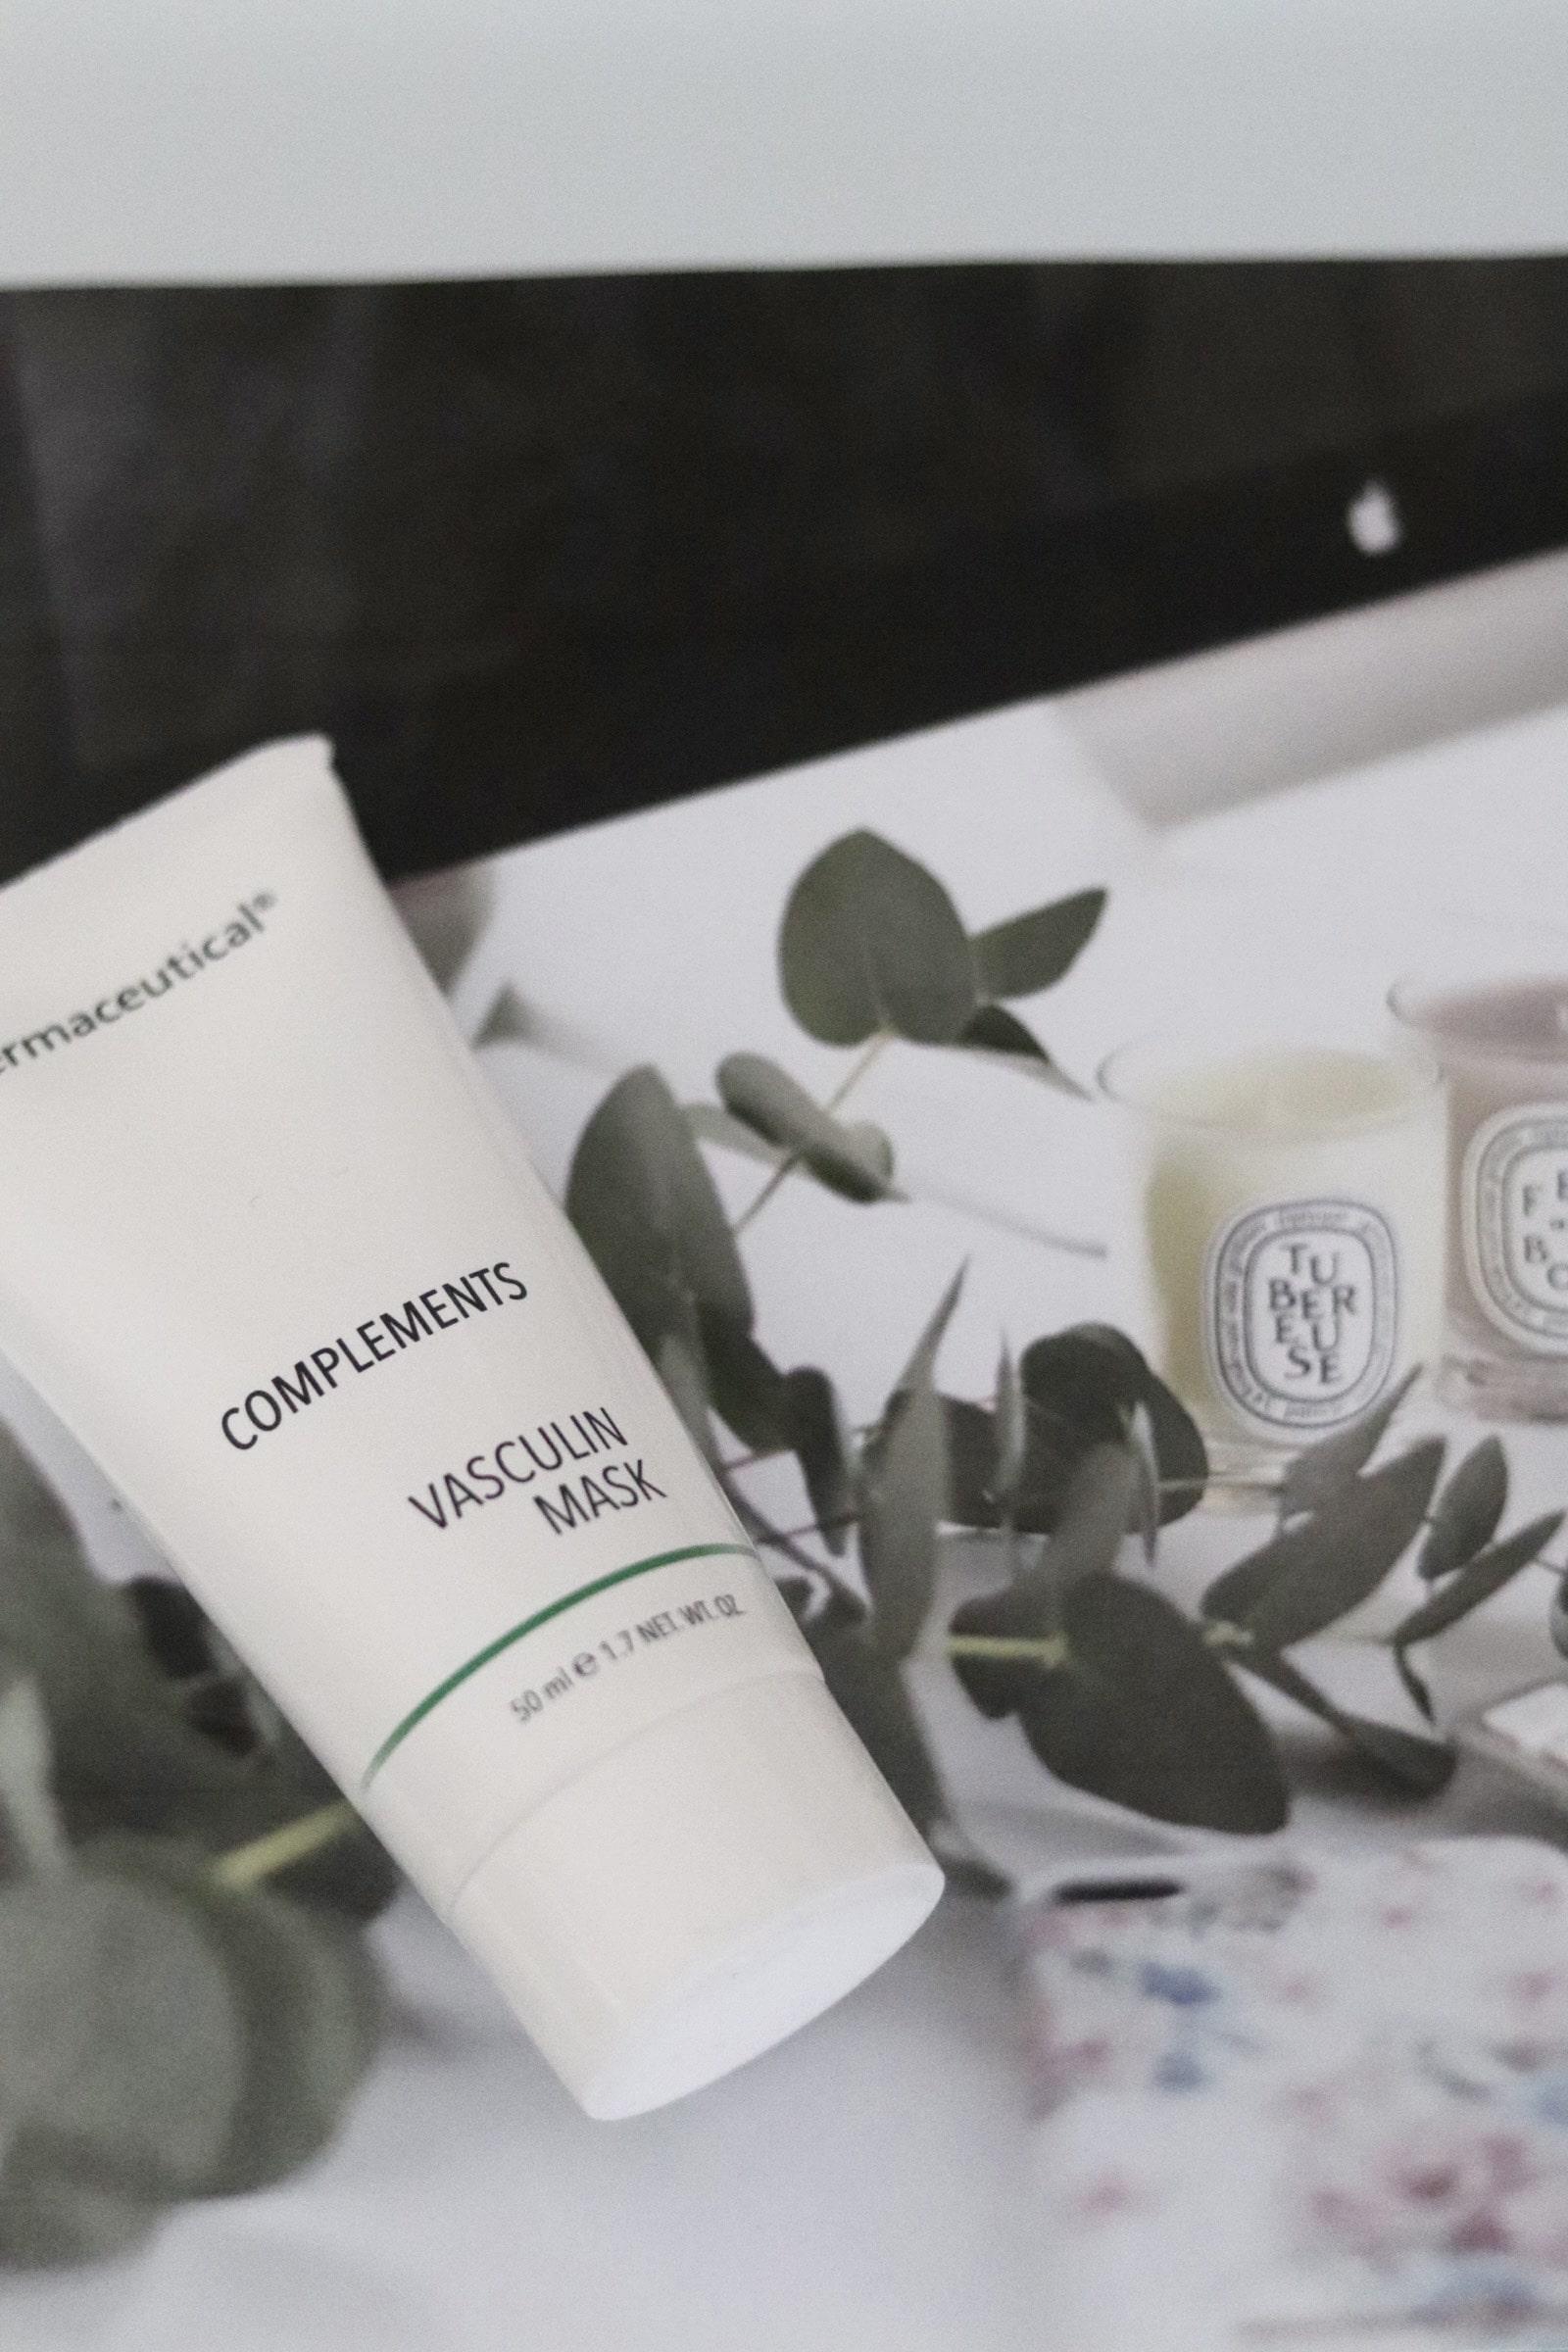 Hautpflege nach dem Urlaub